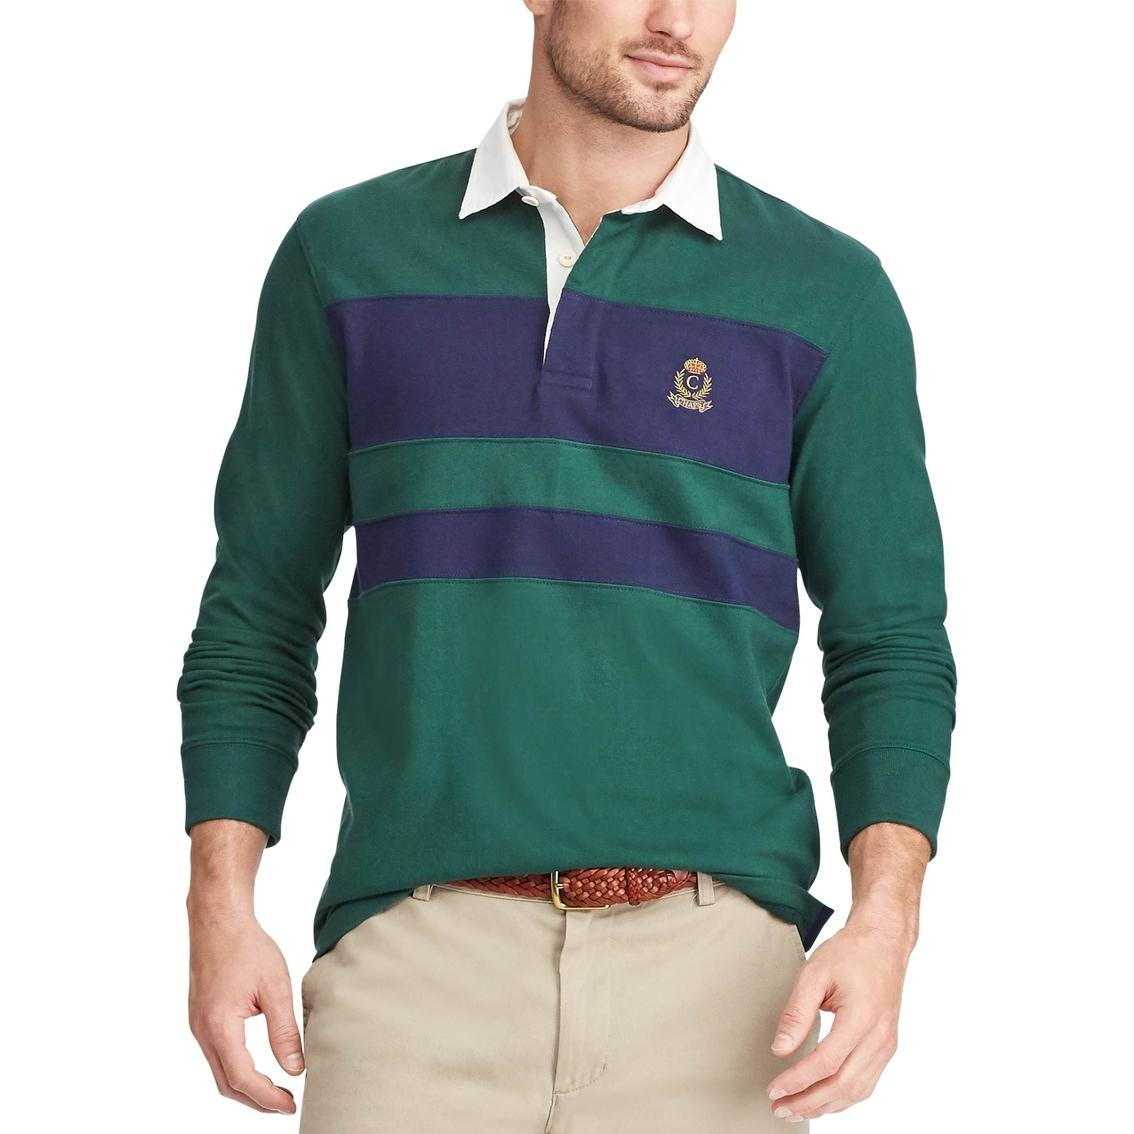 4e13583c424 Chaps Men's Stripe Rugby Shirt | Saturday - Wk 77 | Shop The Exchange